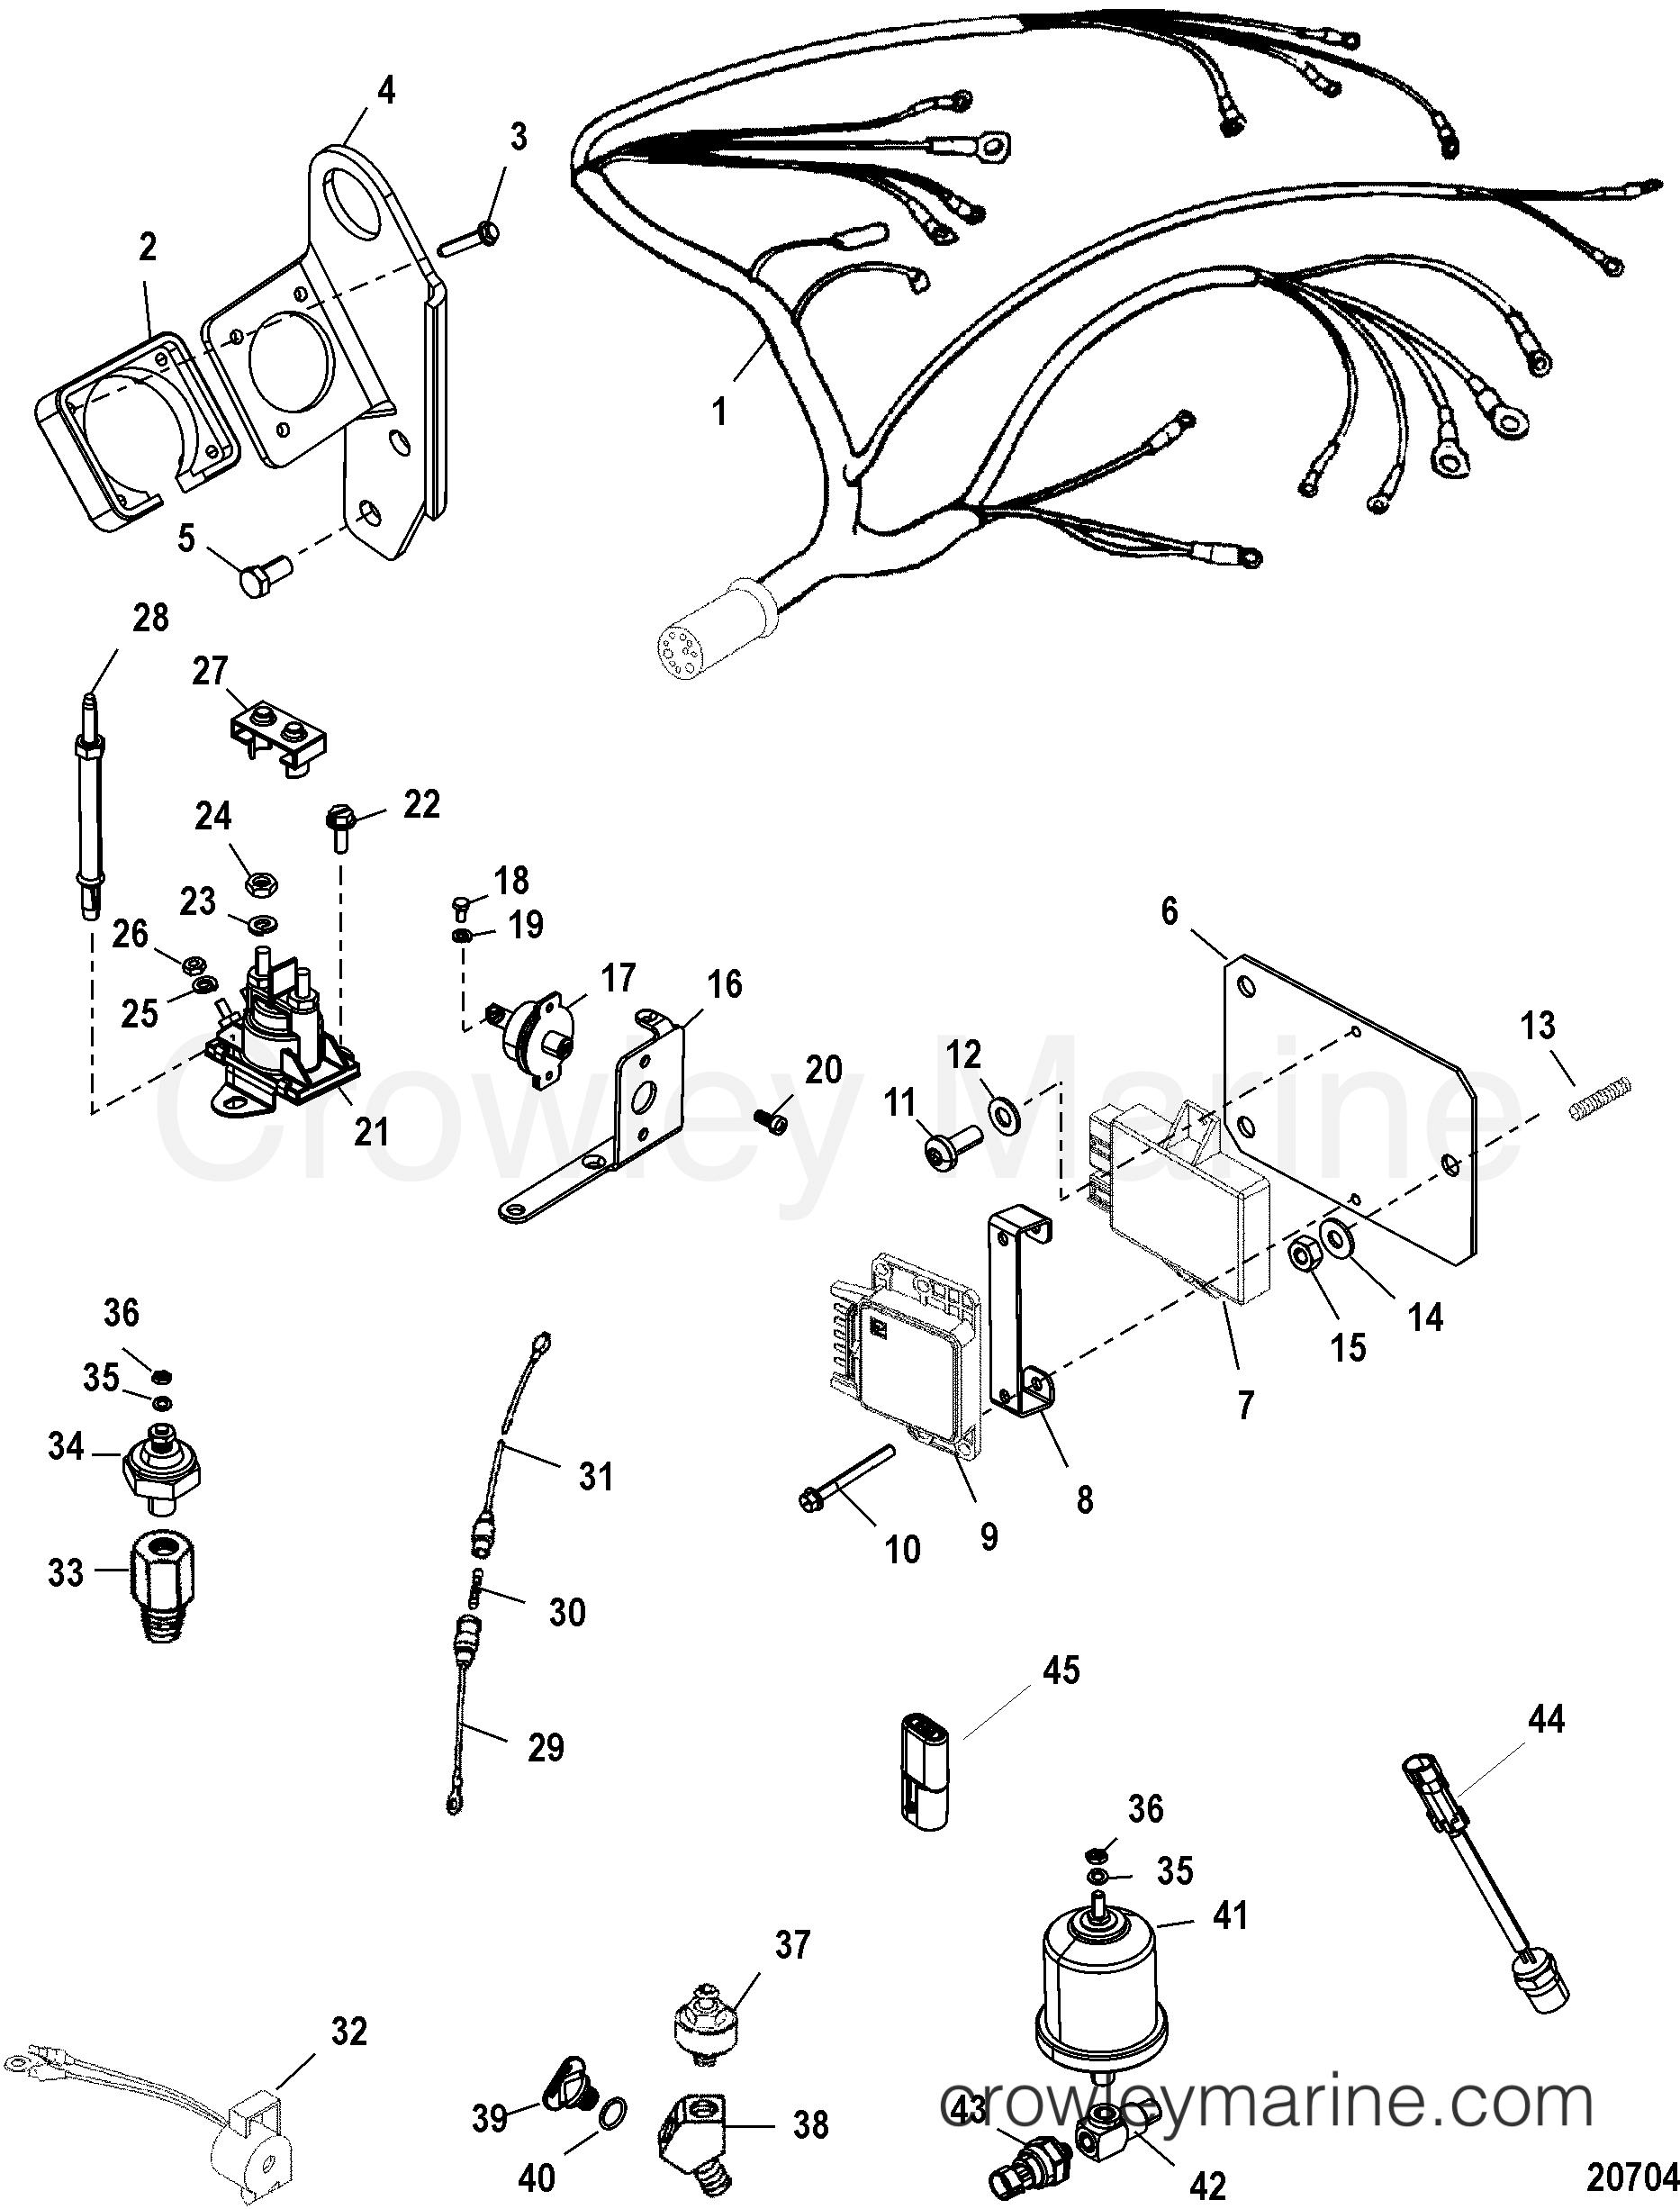 Electrical Components  Bravo 0w310000 Thru 0w649999